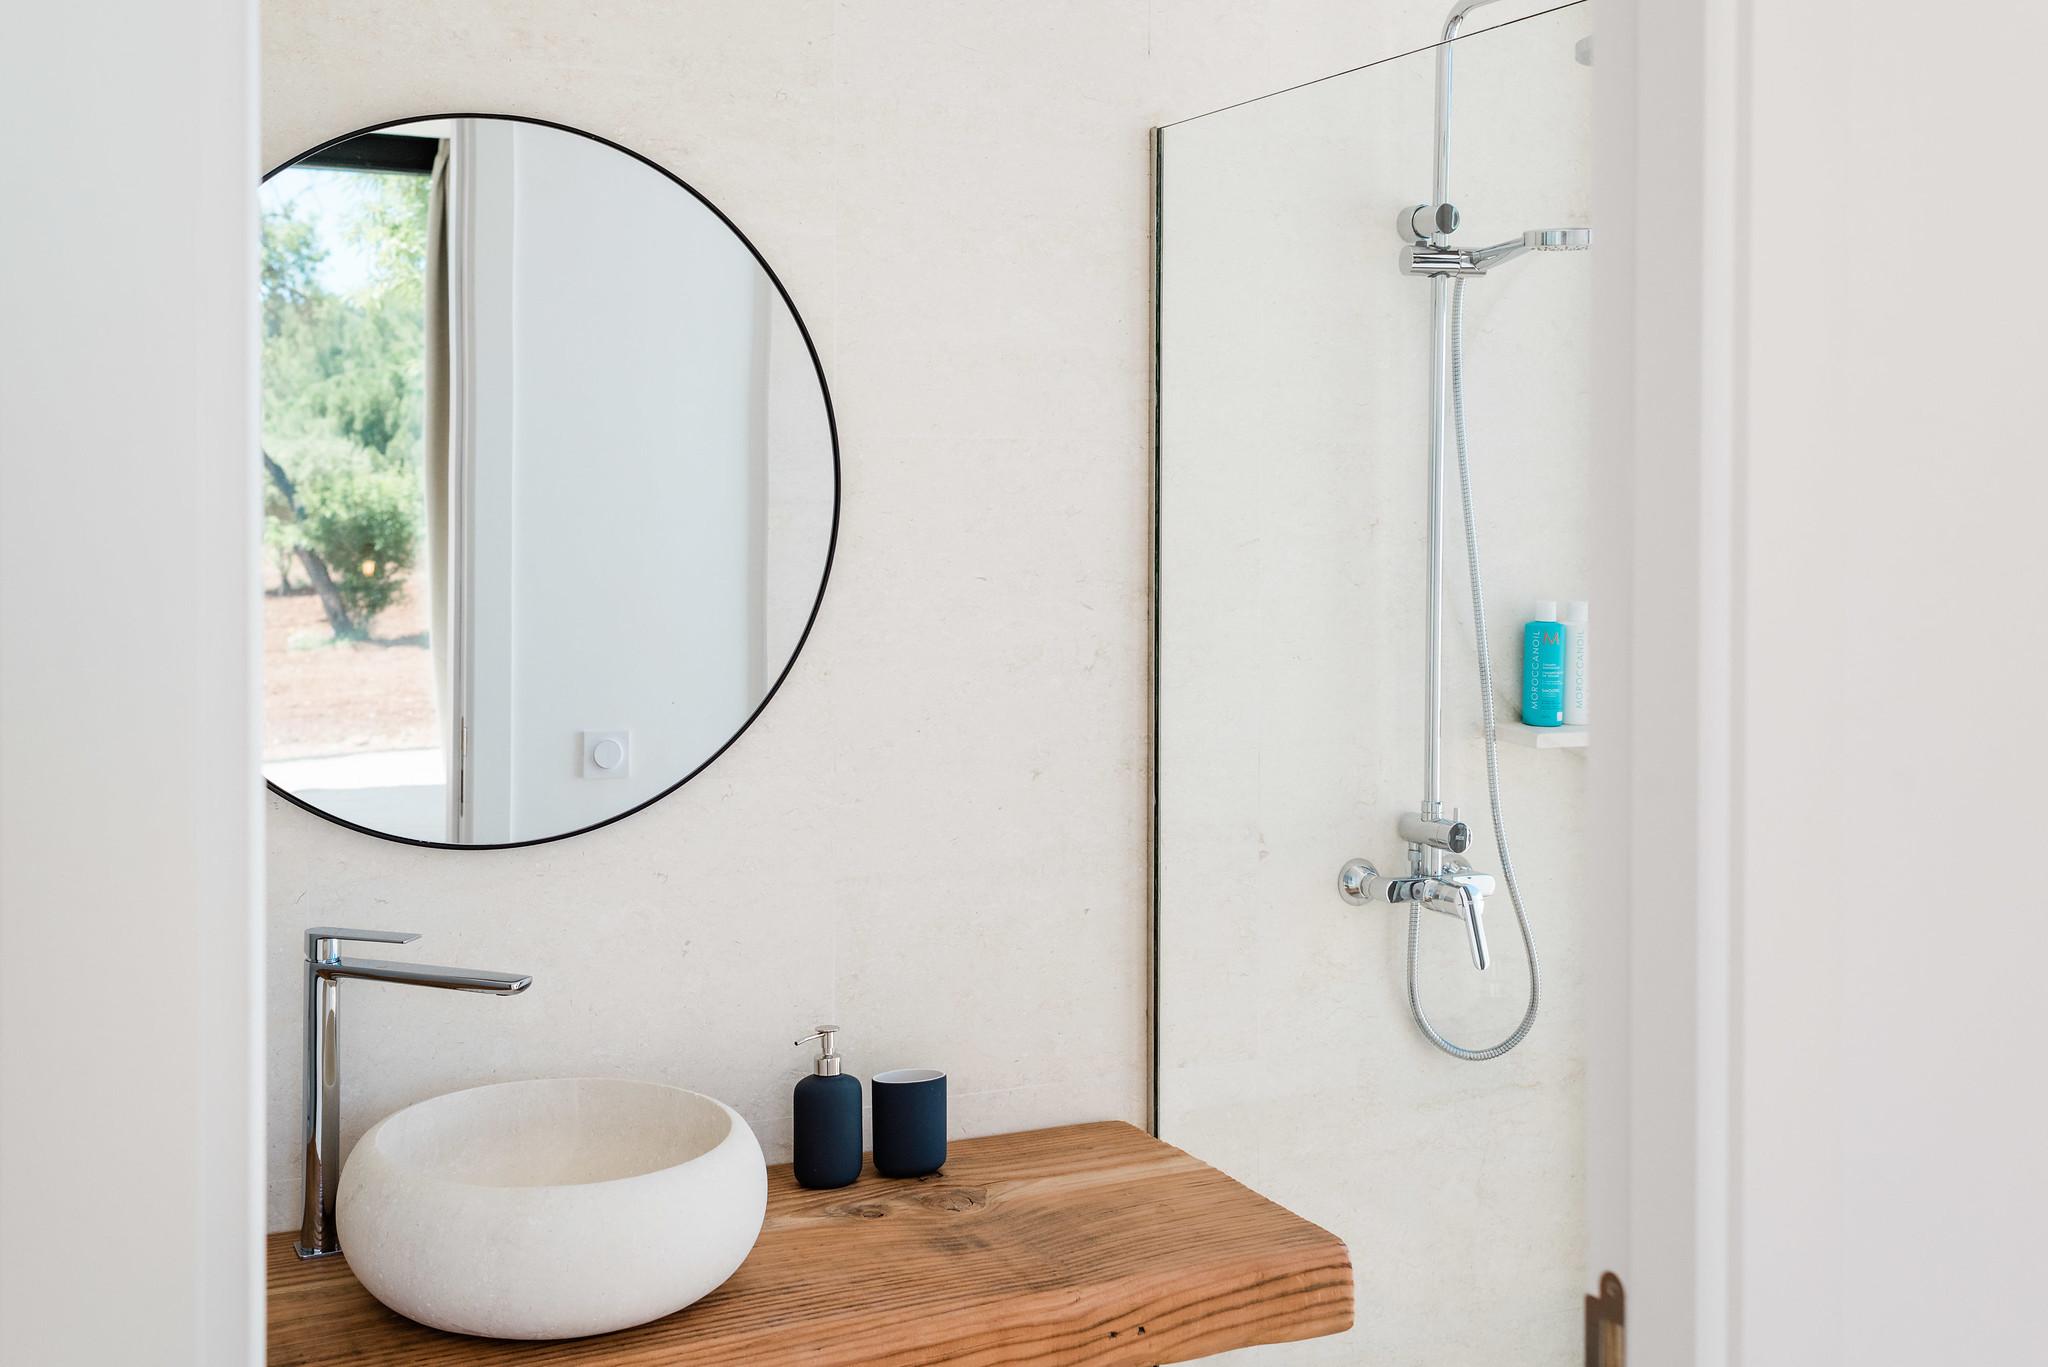 https://www.white-ibiza.com/wp-content/uploads/2020/06/white-ibiza-villas-can-carmen-interior-bathroom.jpg